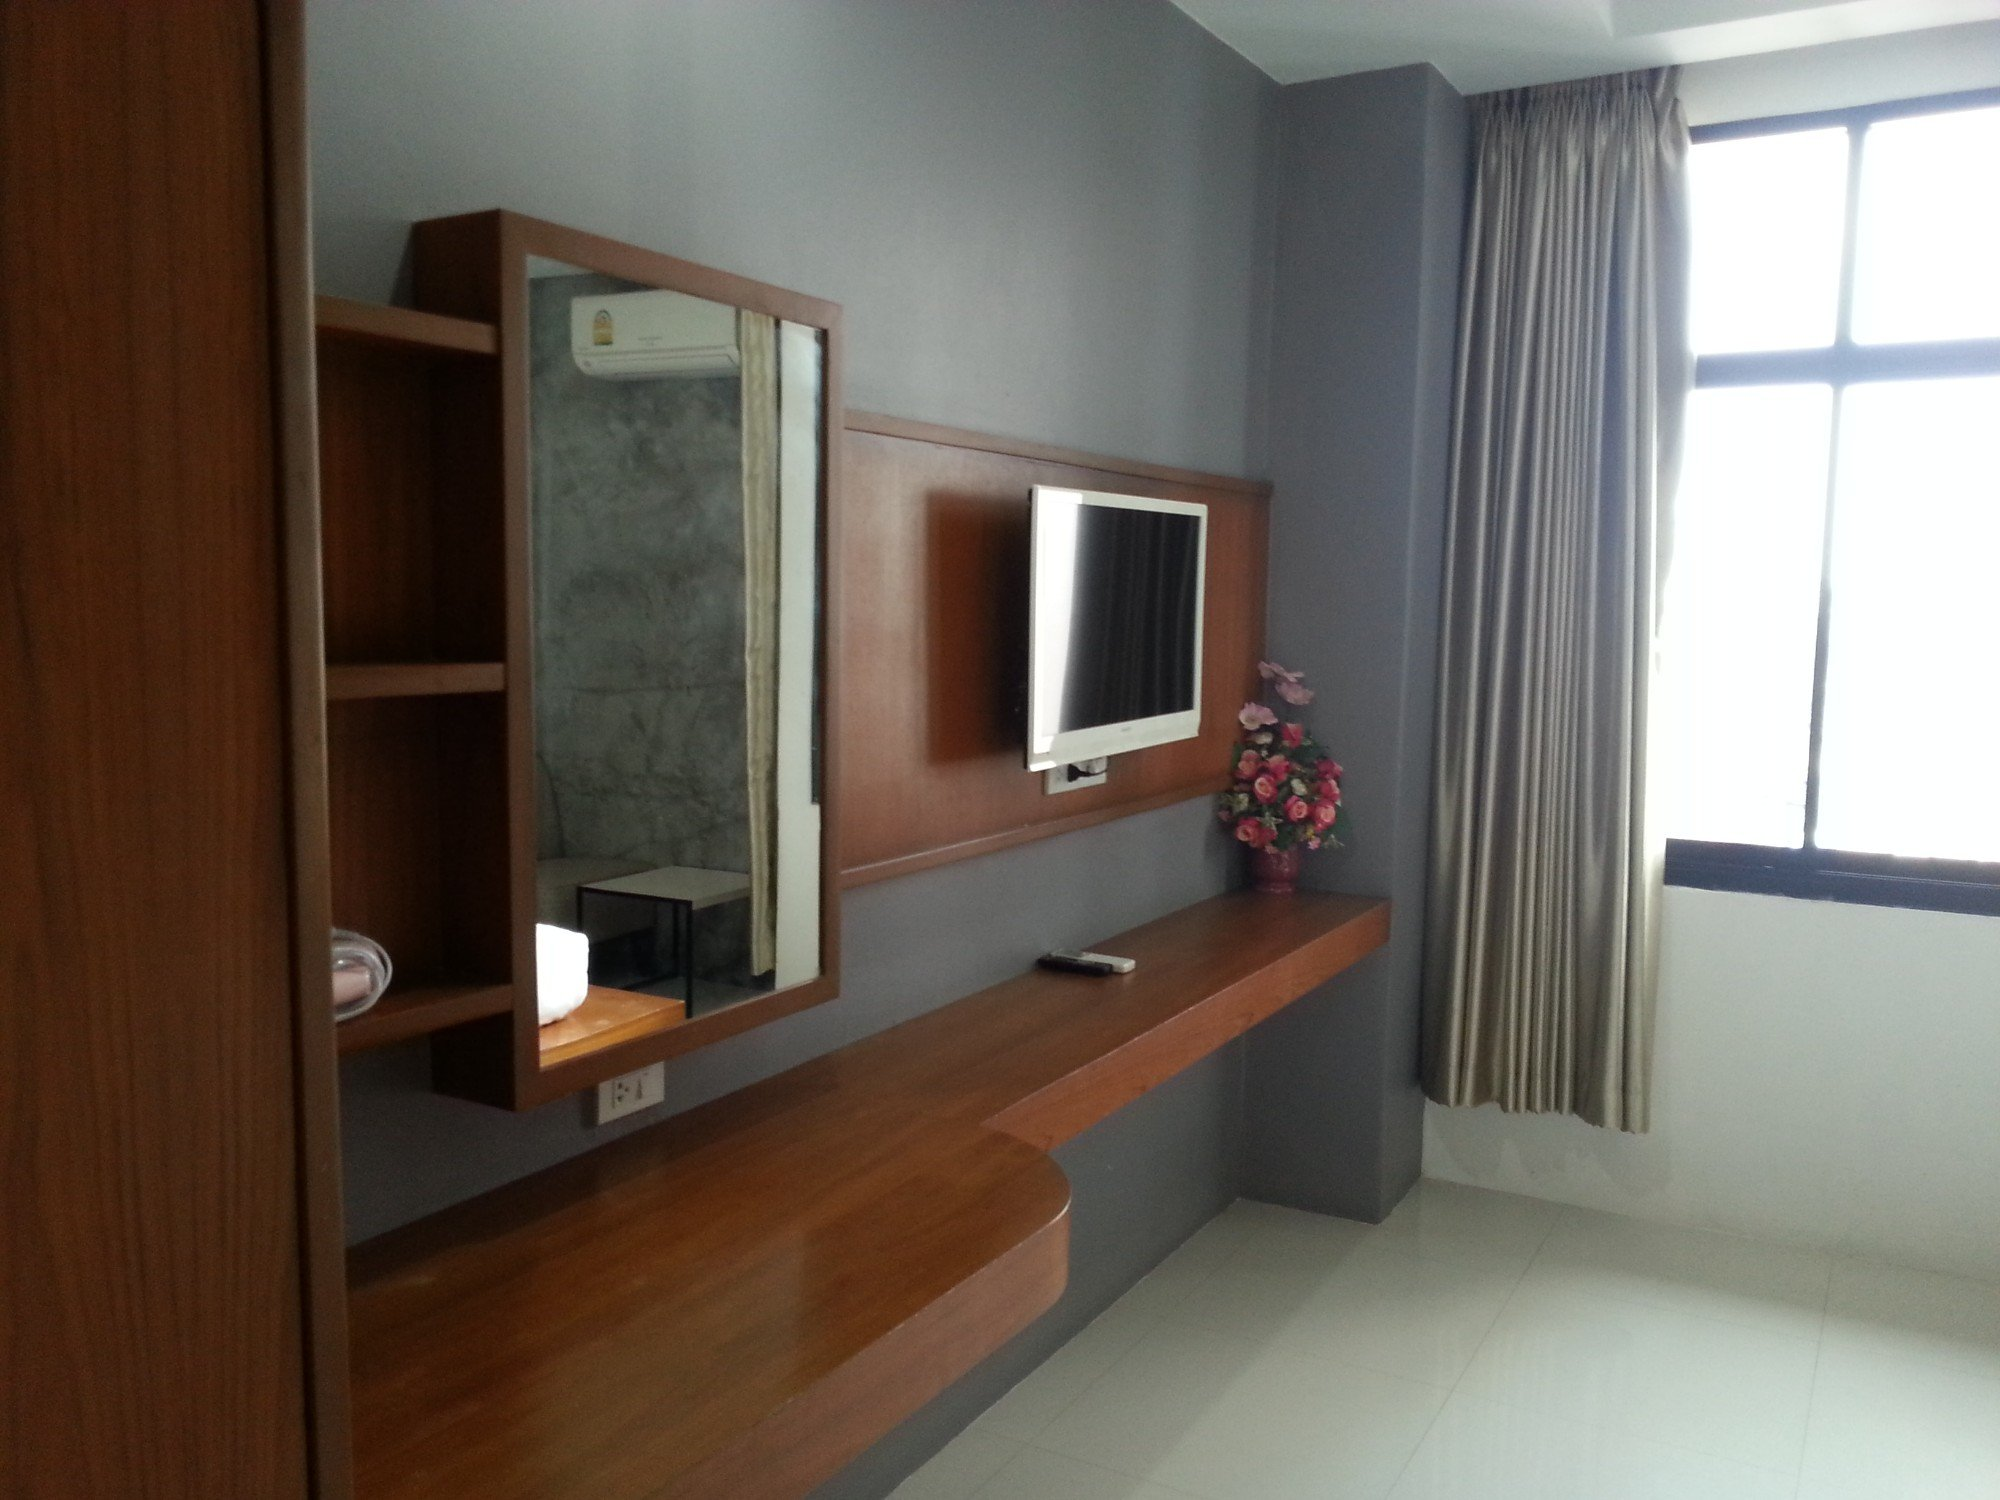 Flat screen TV at the Merdelong Hotel